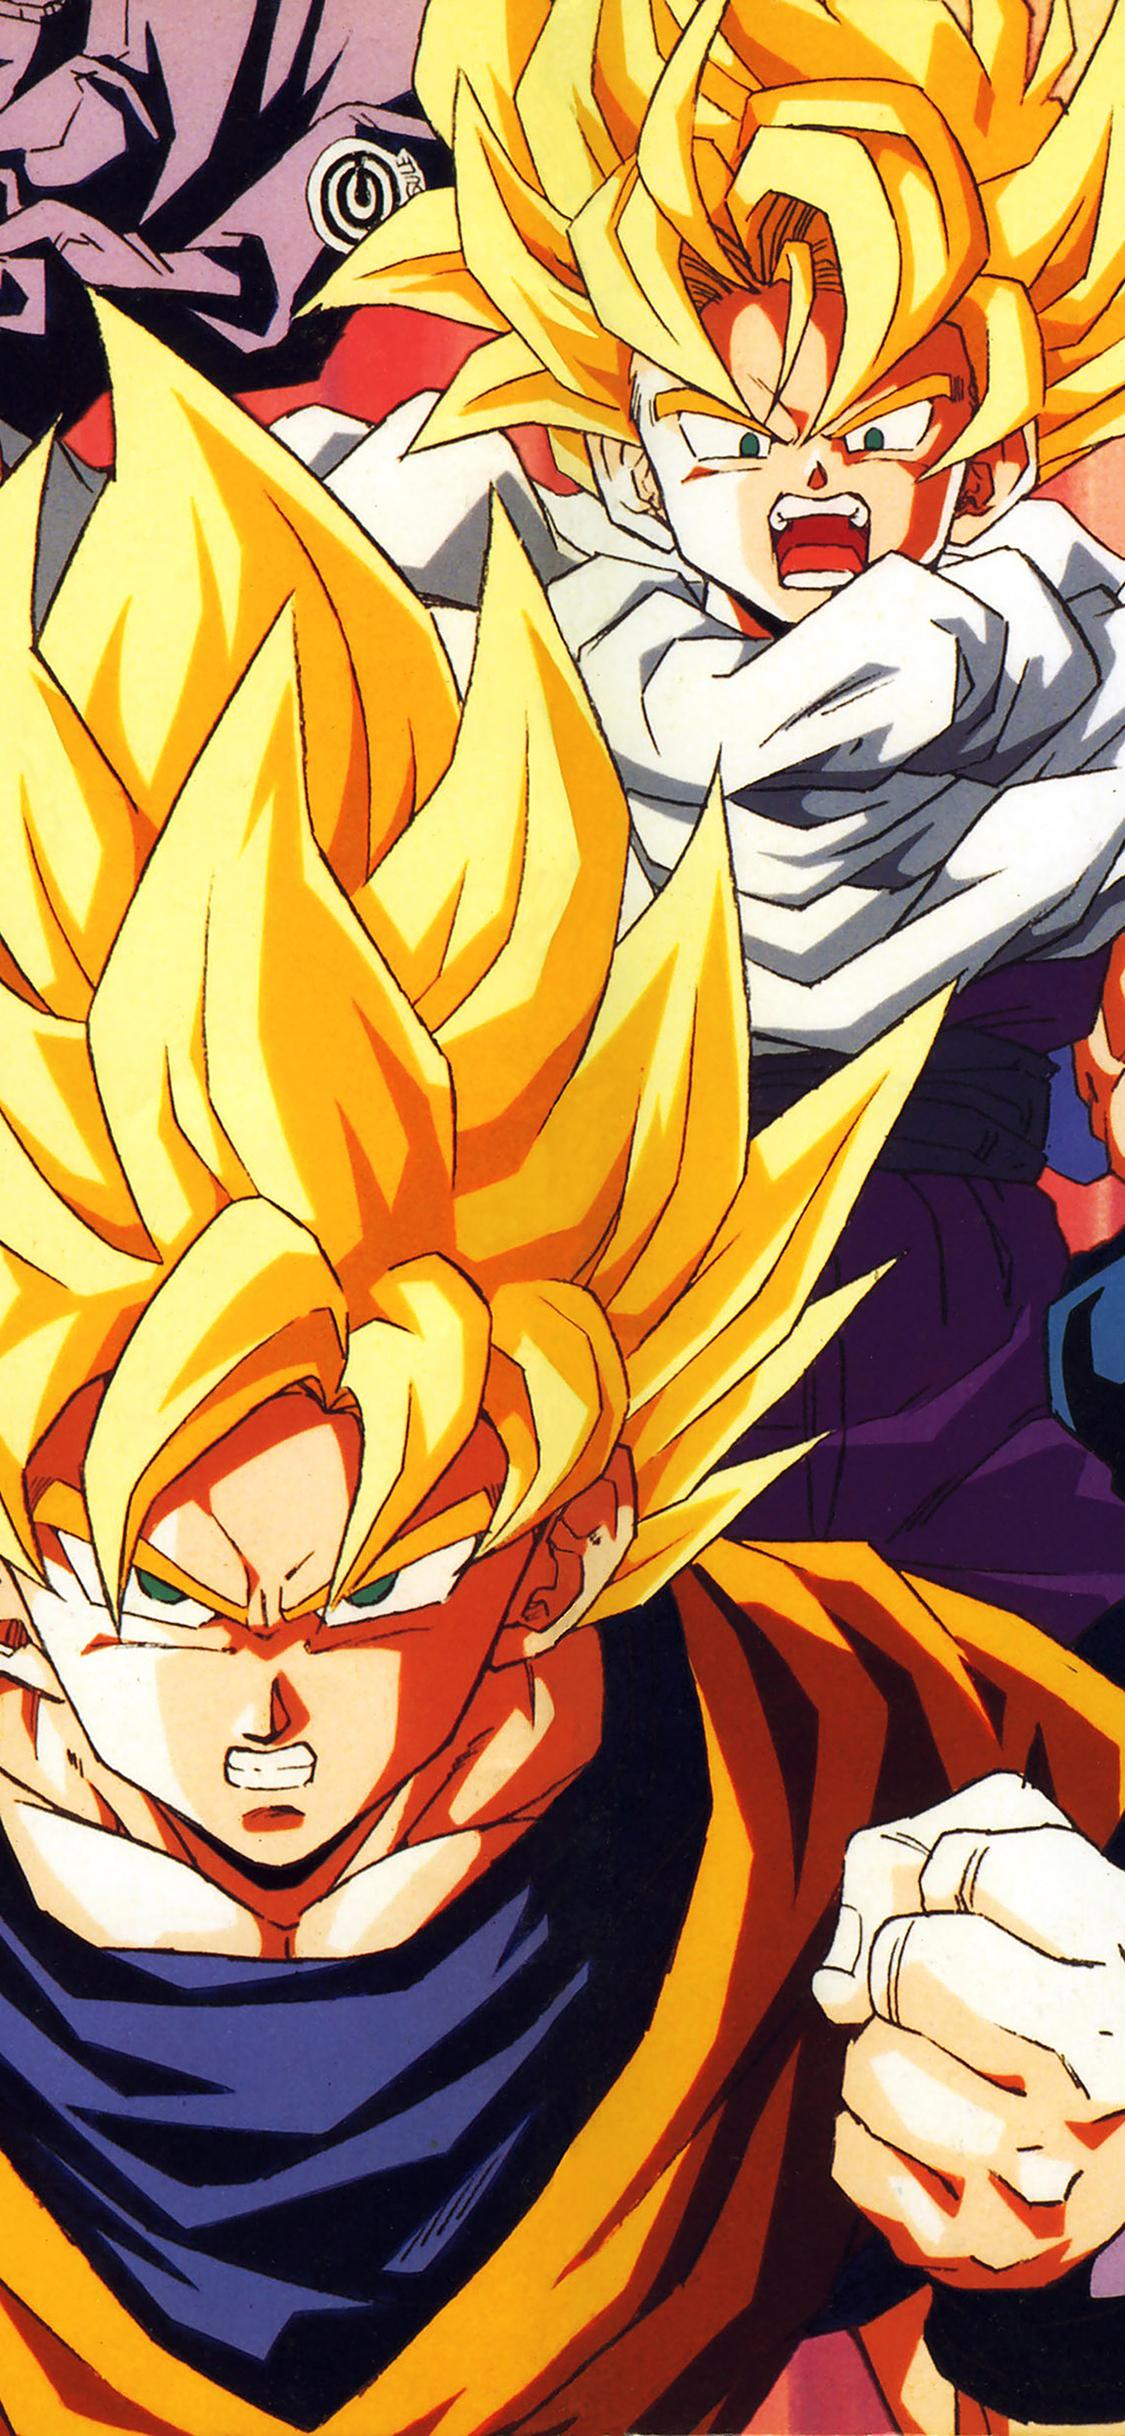 Ab92 Wallpaper Dragonball Z Goku Fire Anime